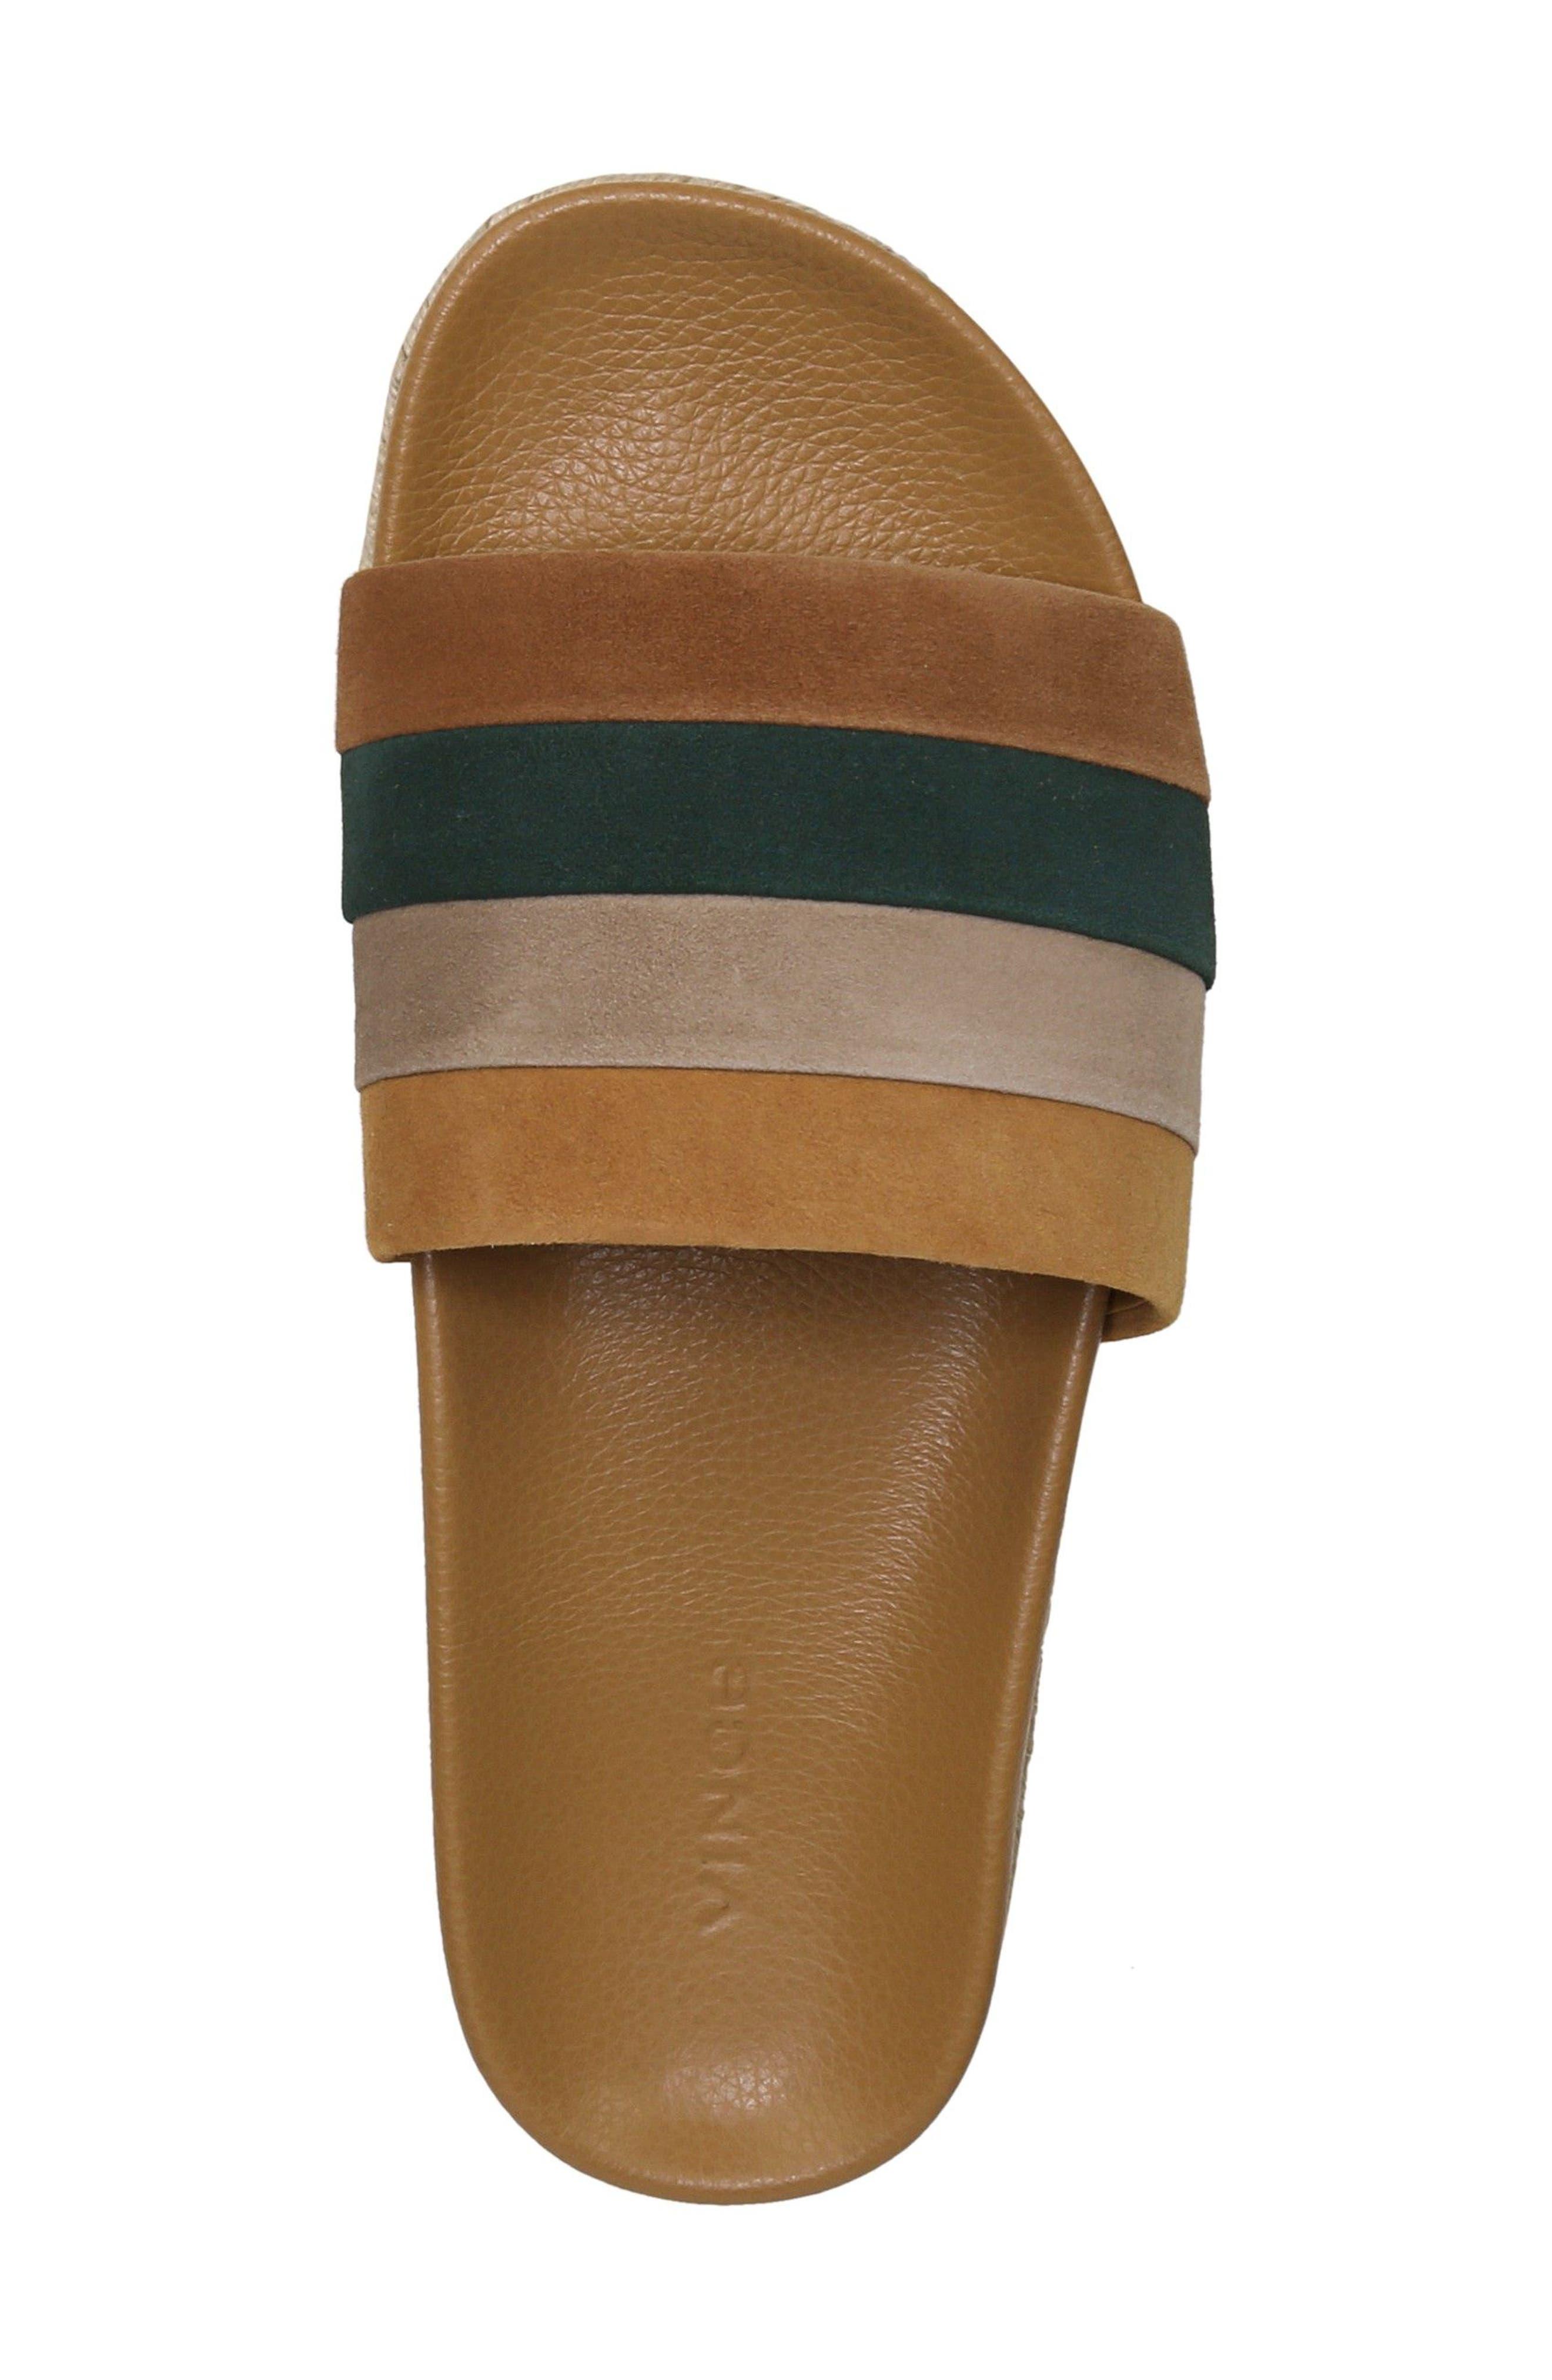 Alisa Striped Slide Sandal,                             Alternate thumbnail 5, color,                             Cedar Multi